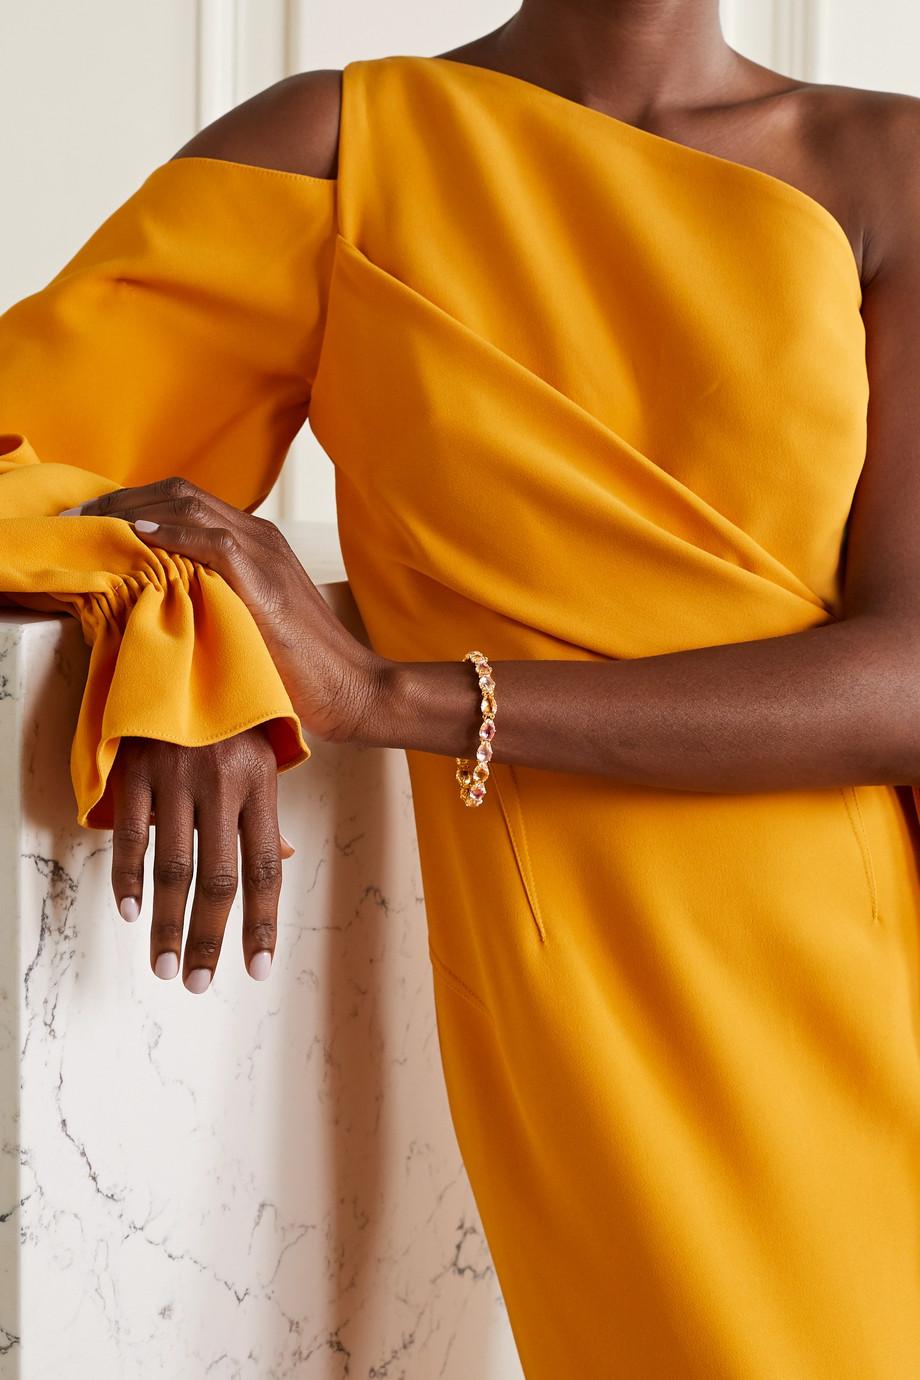 Larkspur & Hawk Caterina 18-karat gold-dipped quartz bracelet